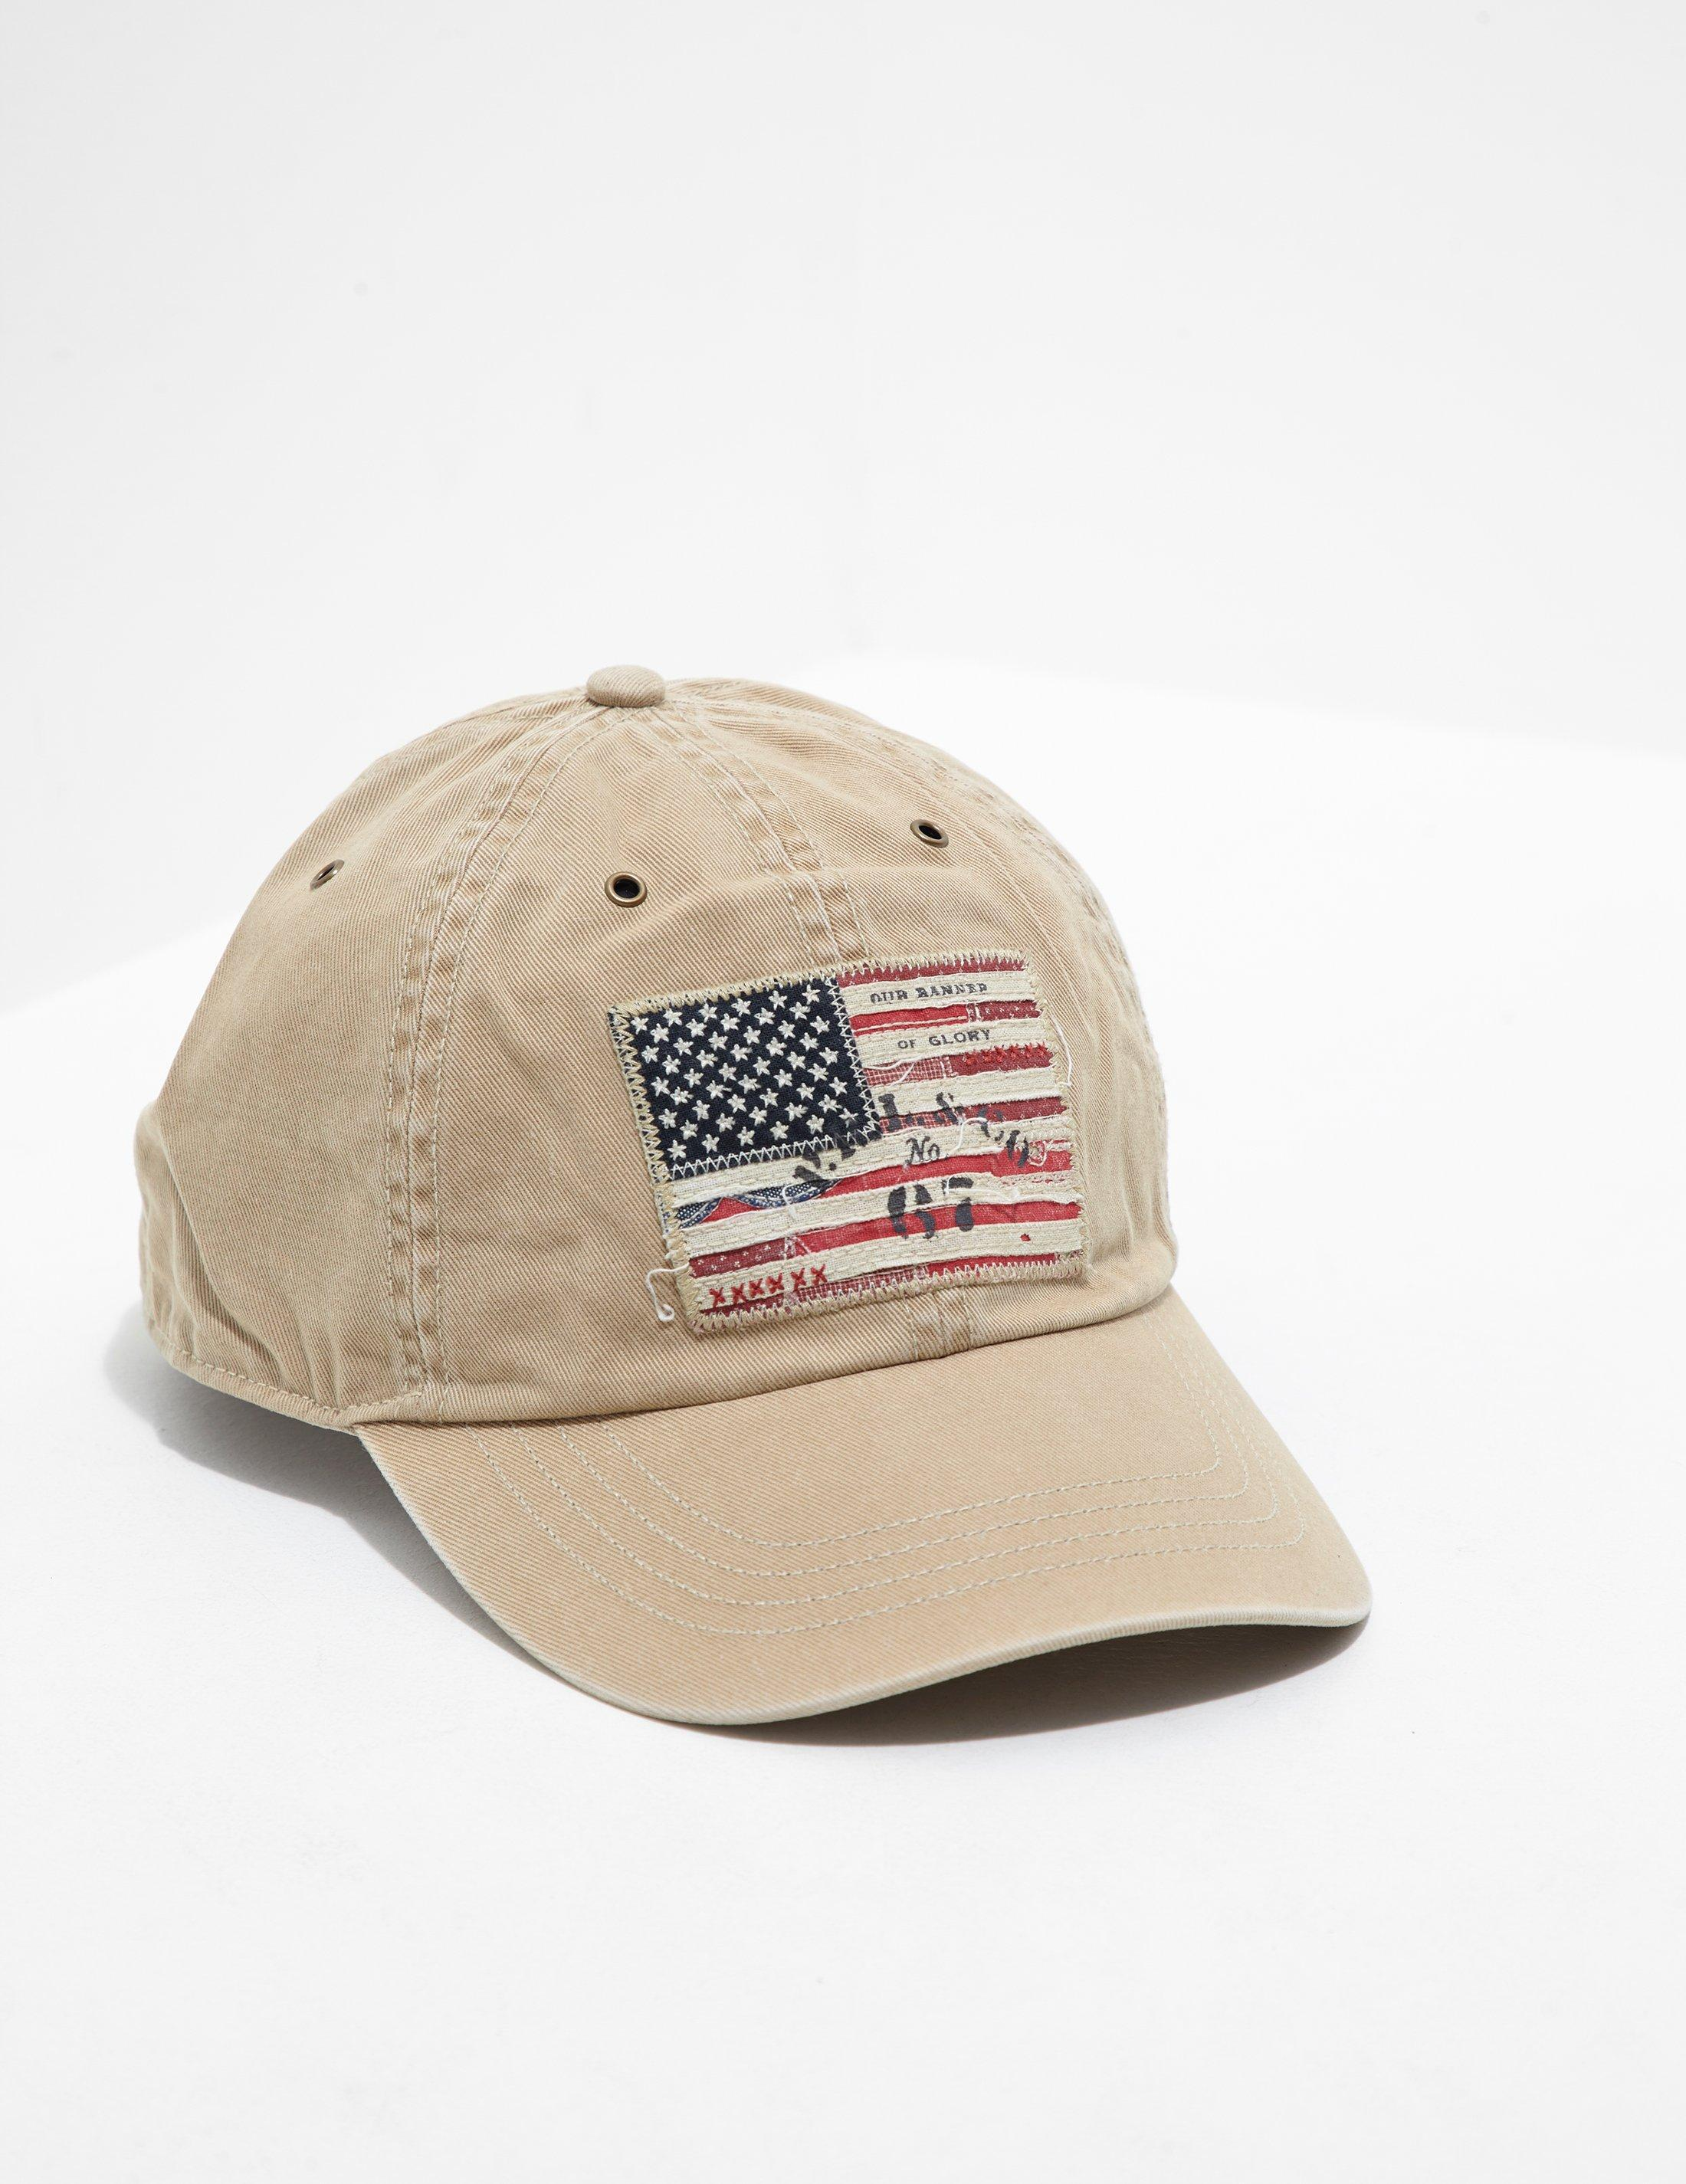 Polo Ralph Lauren Mens Iconic Flag Cap Tan in Brown for Men - Lyst 39316806480